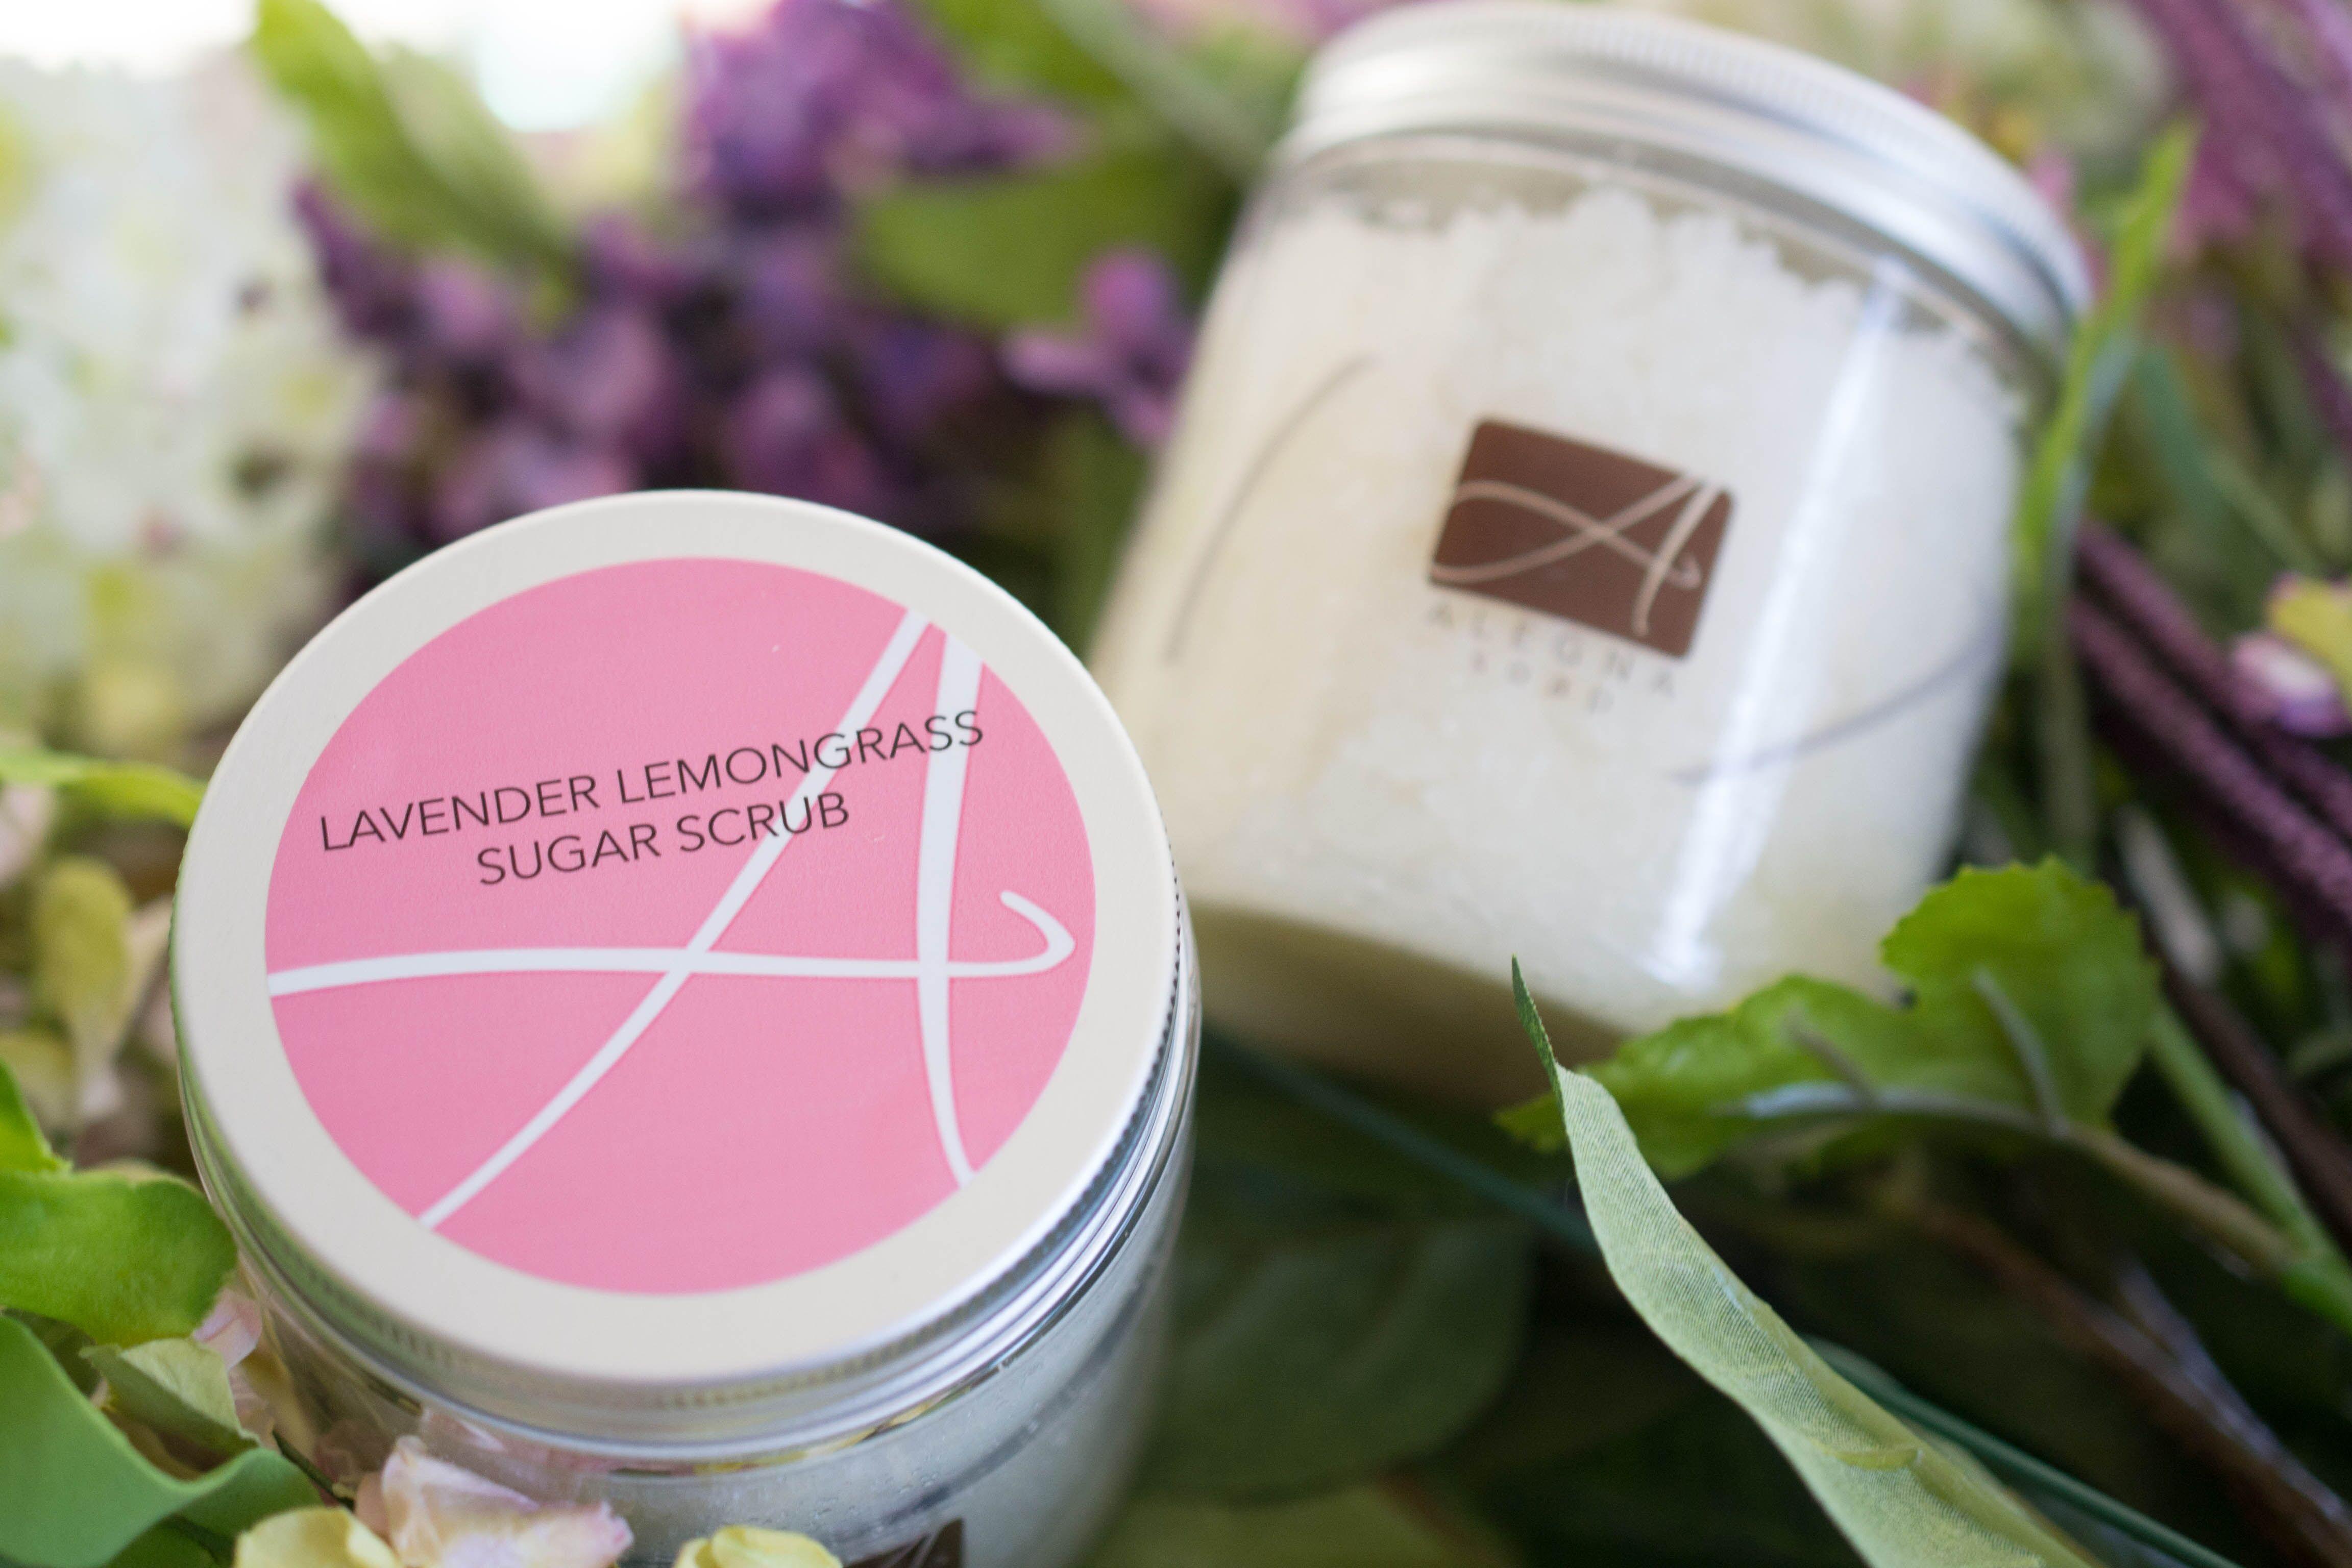 Photo Friday- Lavender Lemongrass Sugar Scrub